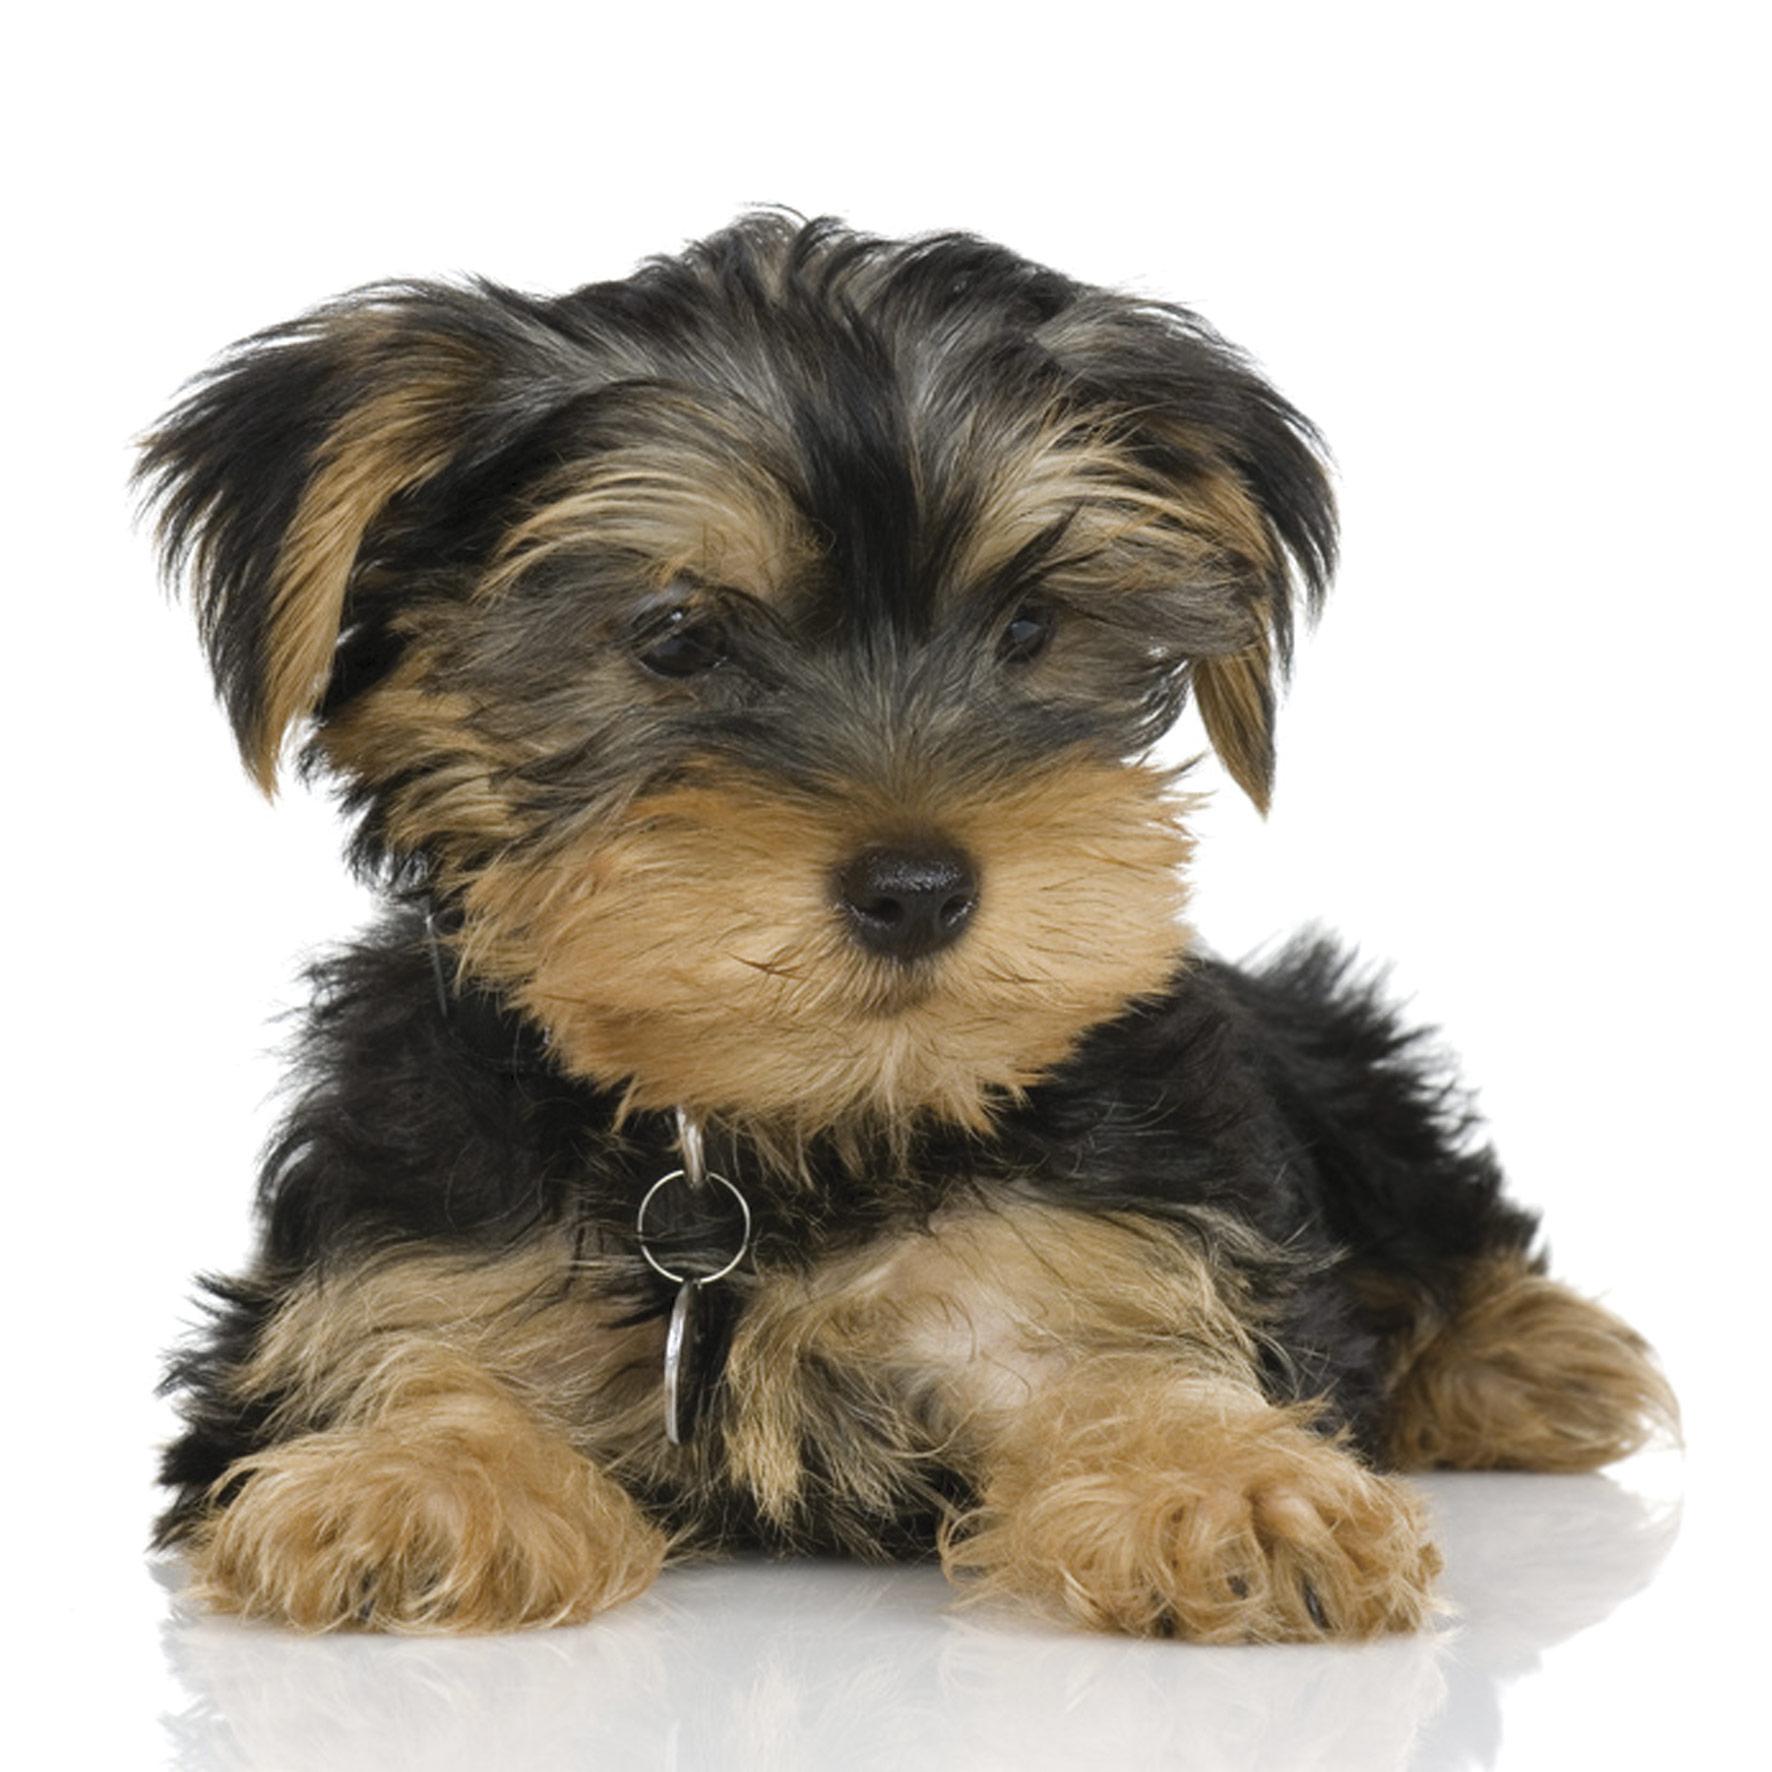 Tidy-Tails-Puppy.jpg